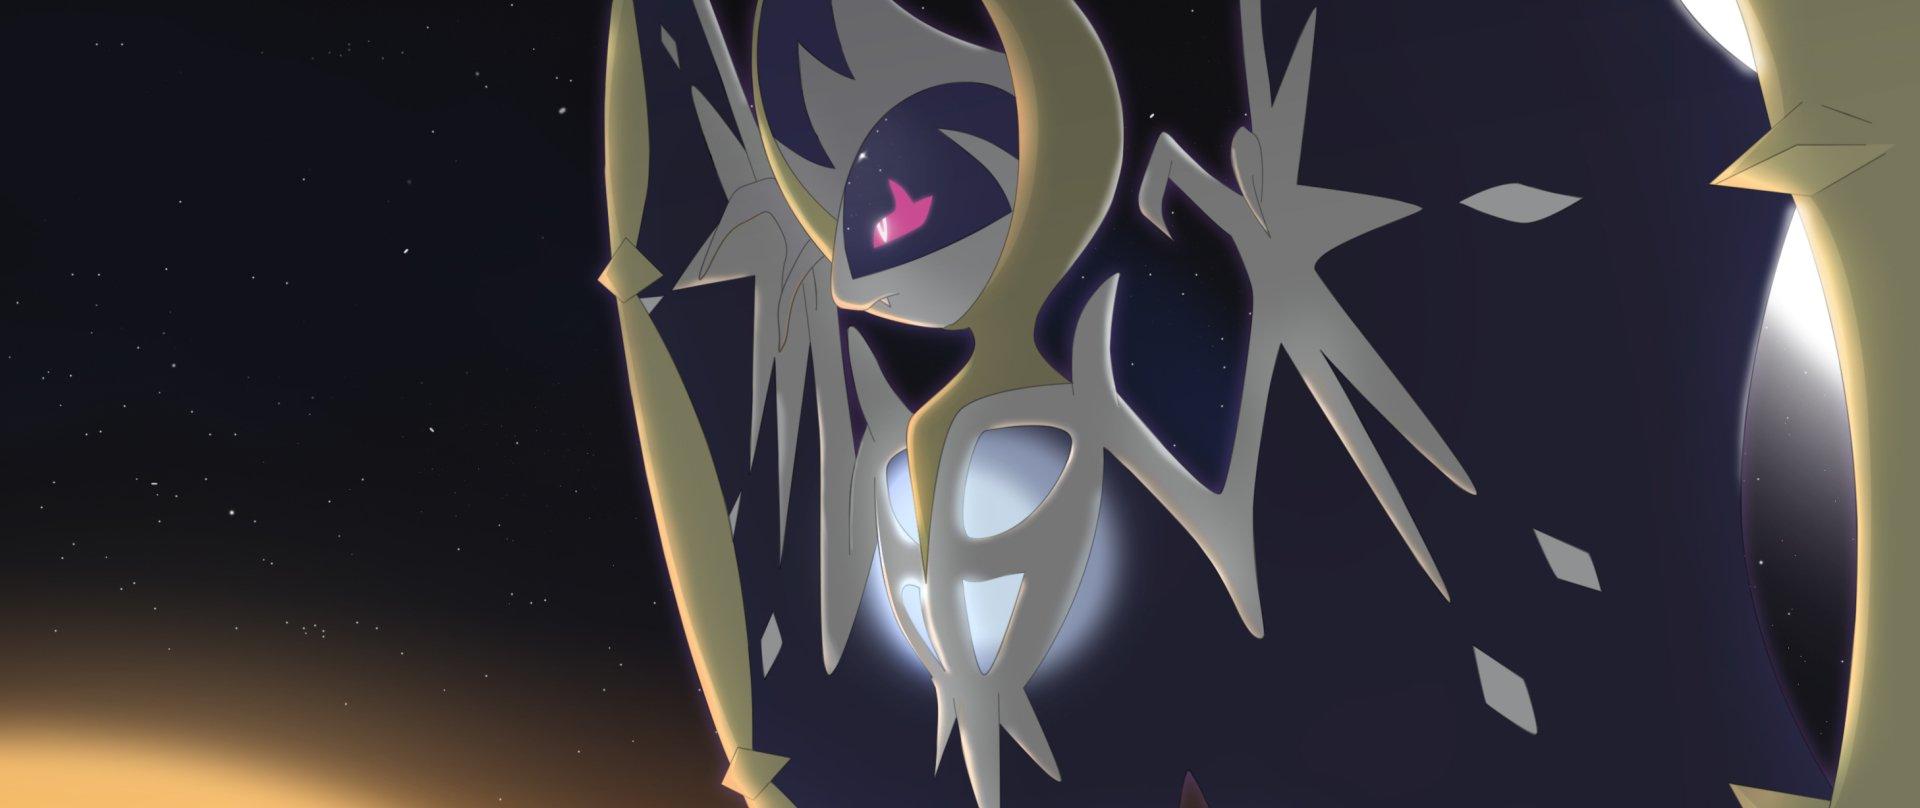 Video Game - Pokémon: Sun and Moon  Lunala (Pokémon) Pokémon Pokémon Sun And Moon Pokémon Moon Wallpaper